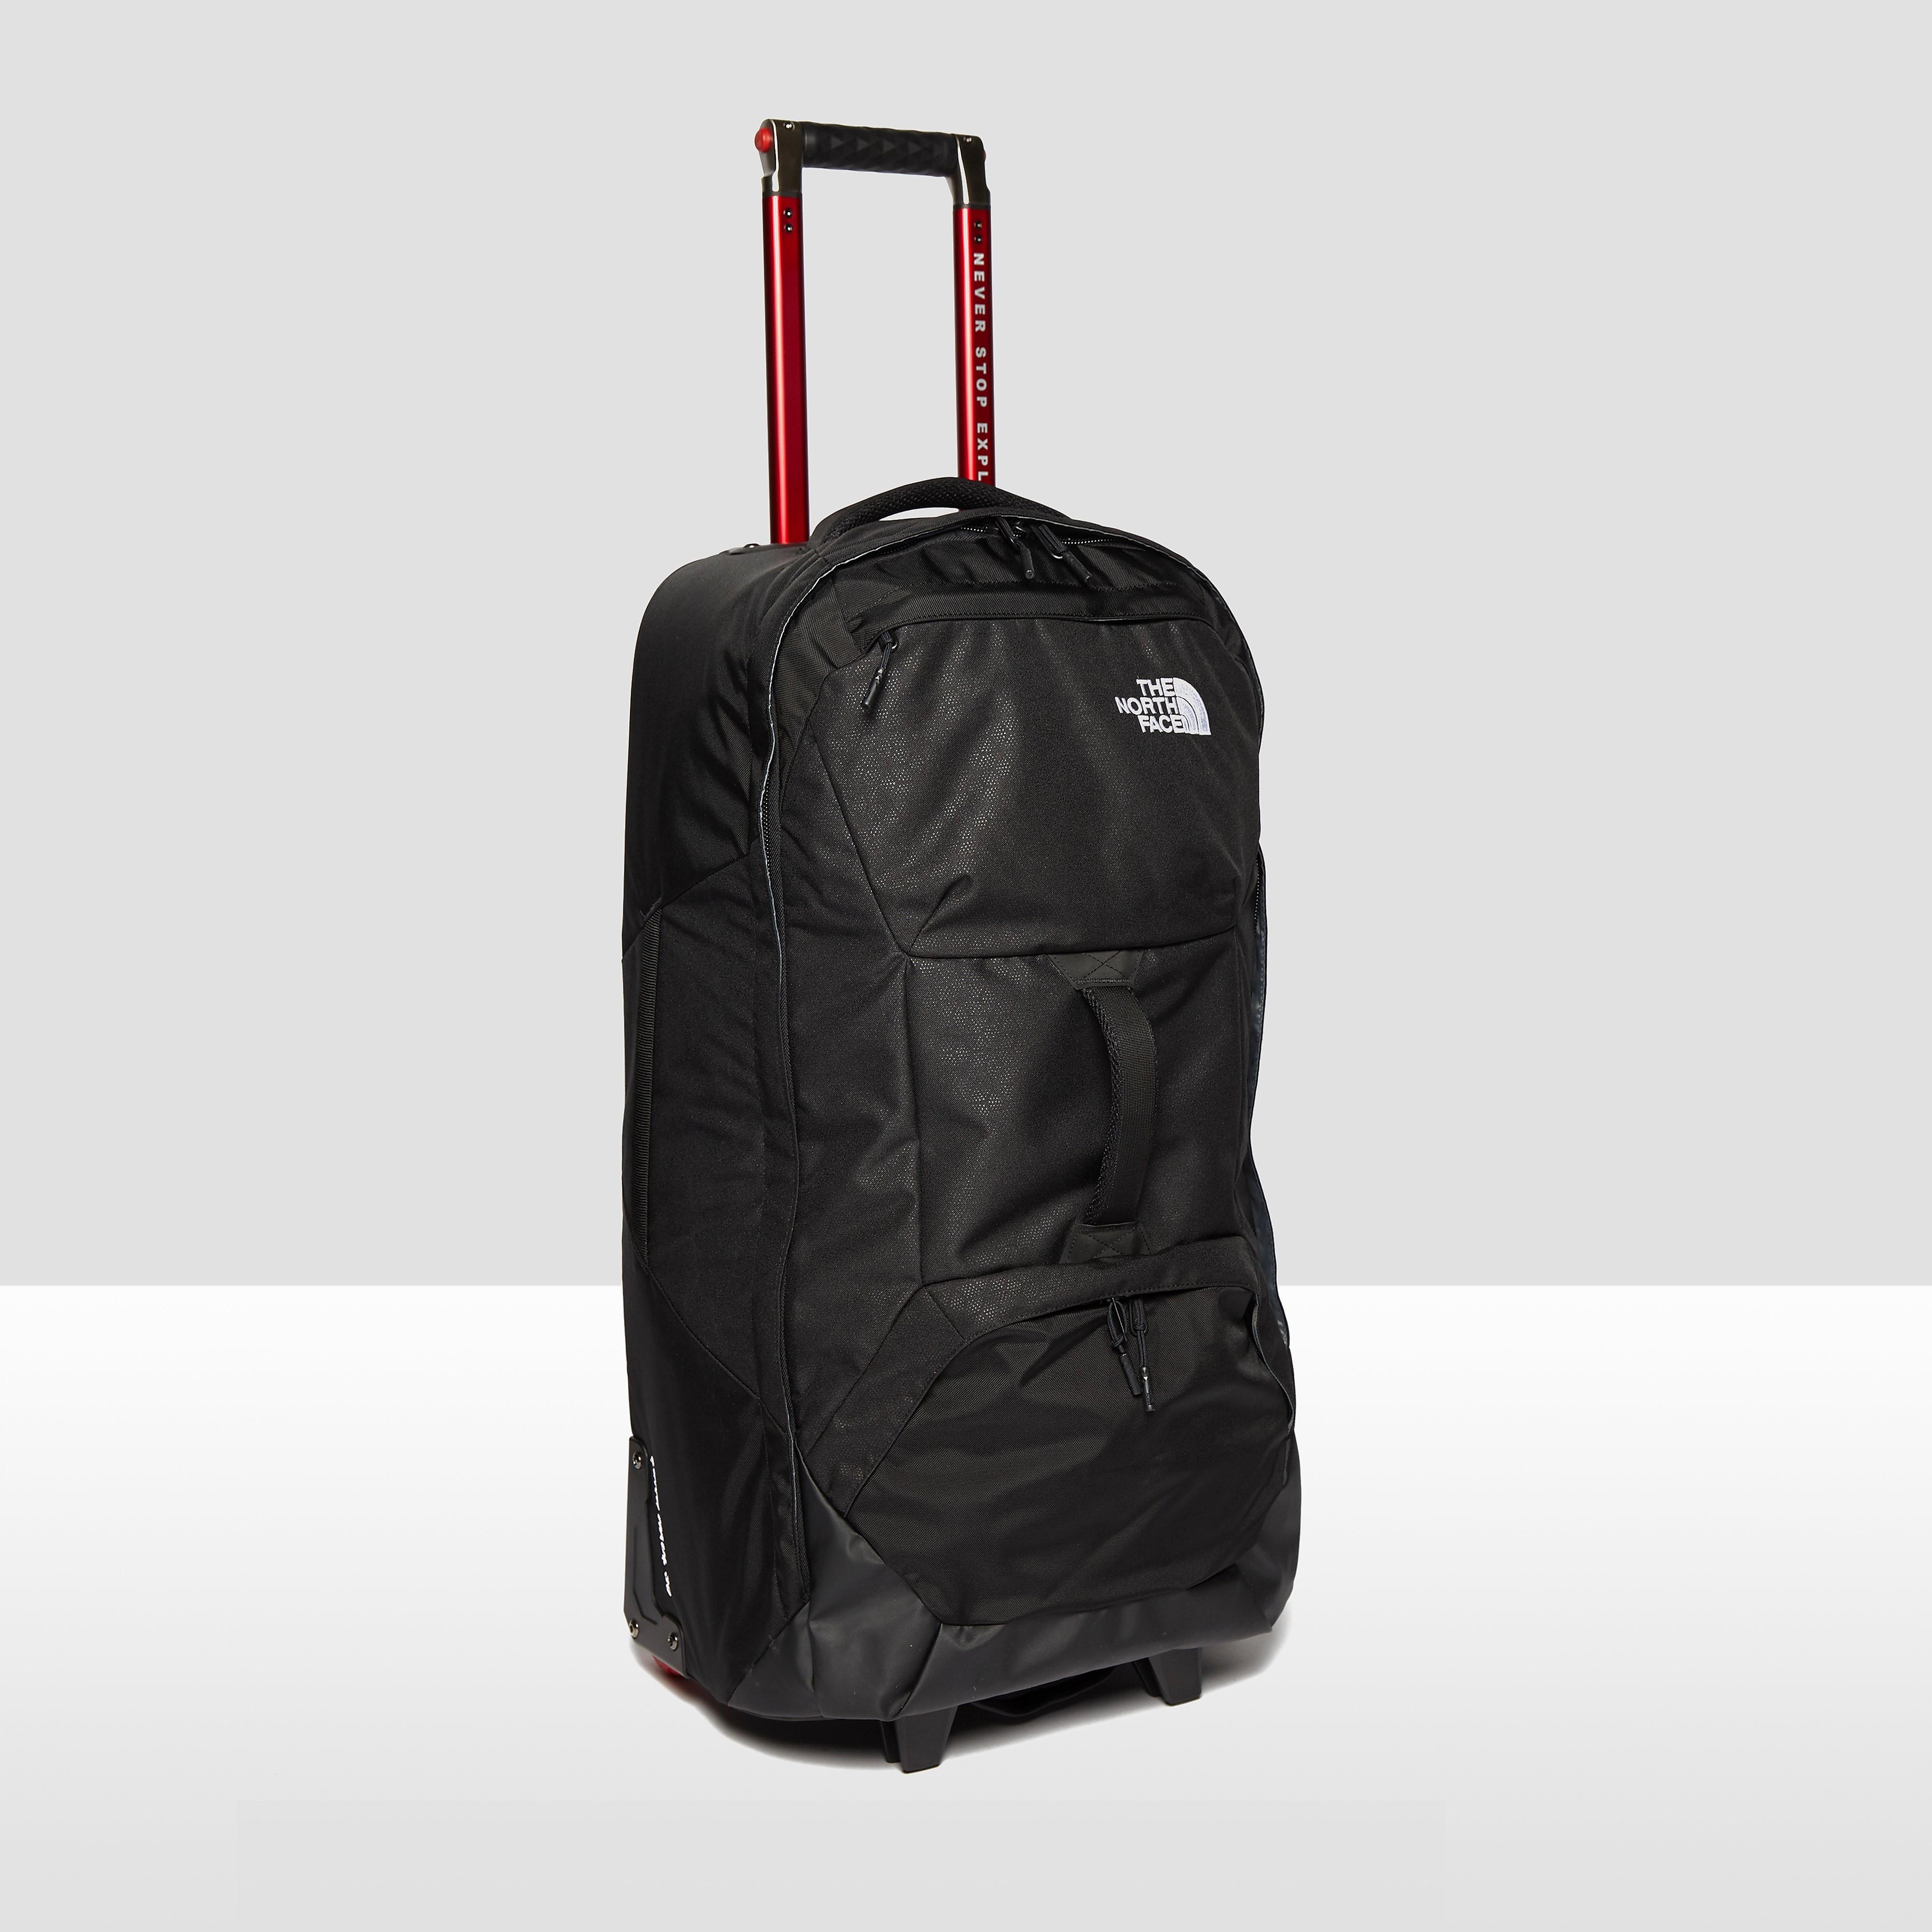 "The North Face Longhaul 30"" 88L Travel Case"